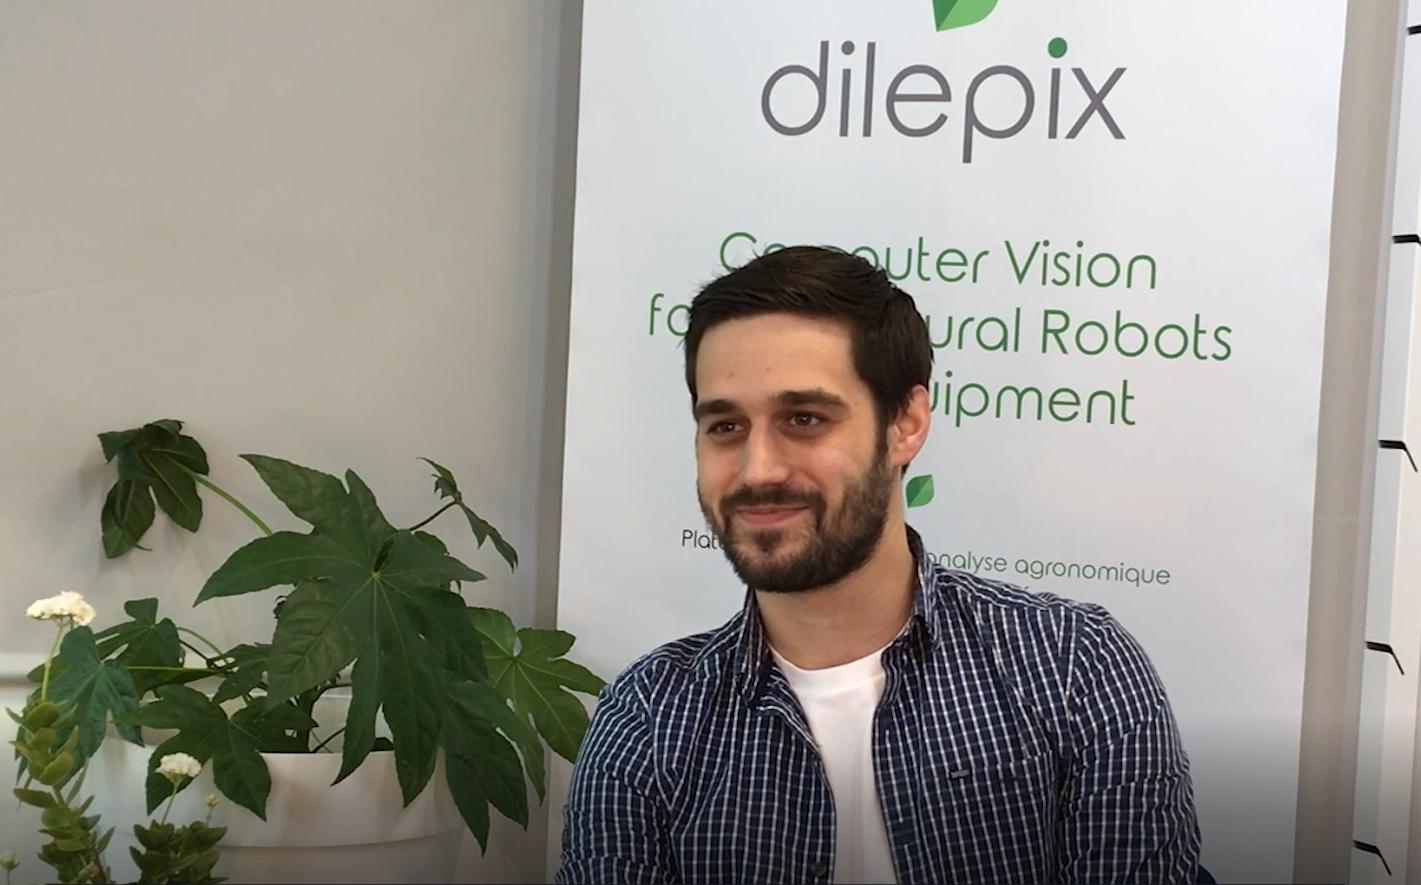 Dilepix interviewée par Inria